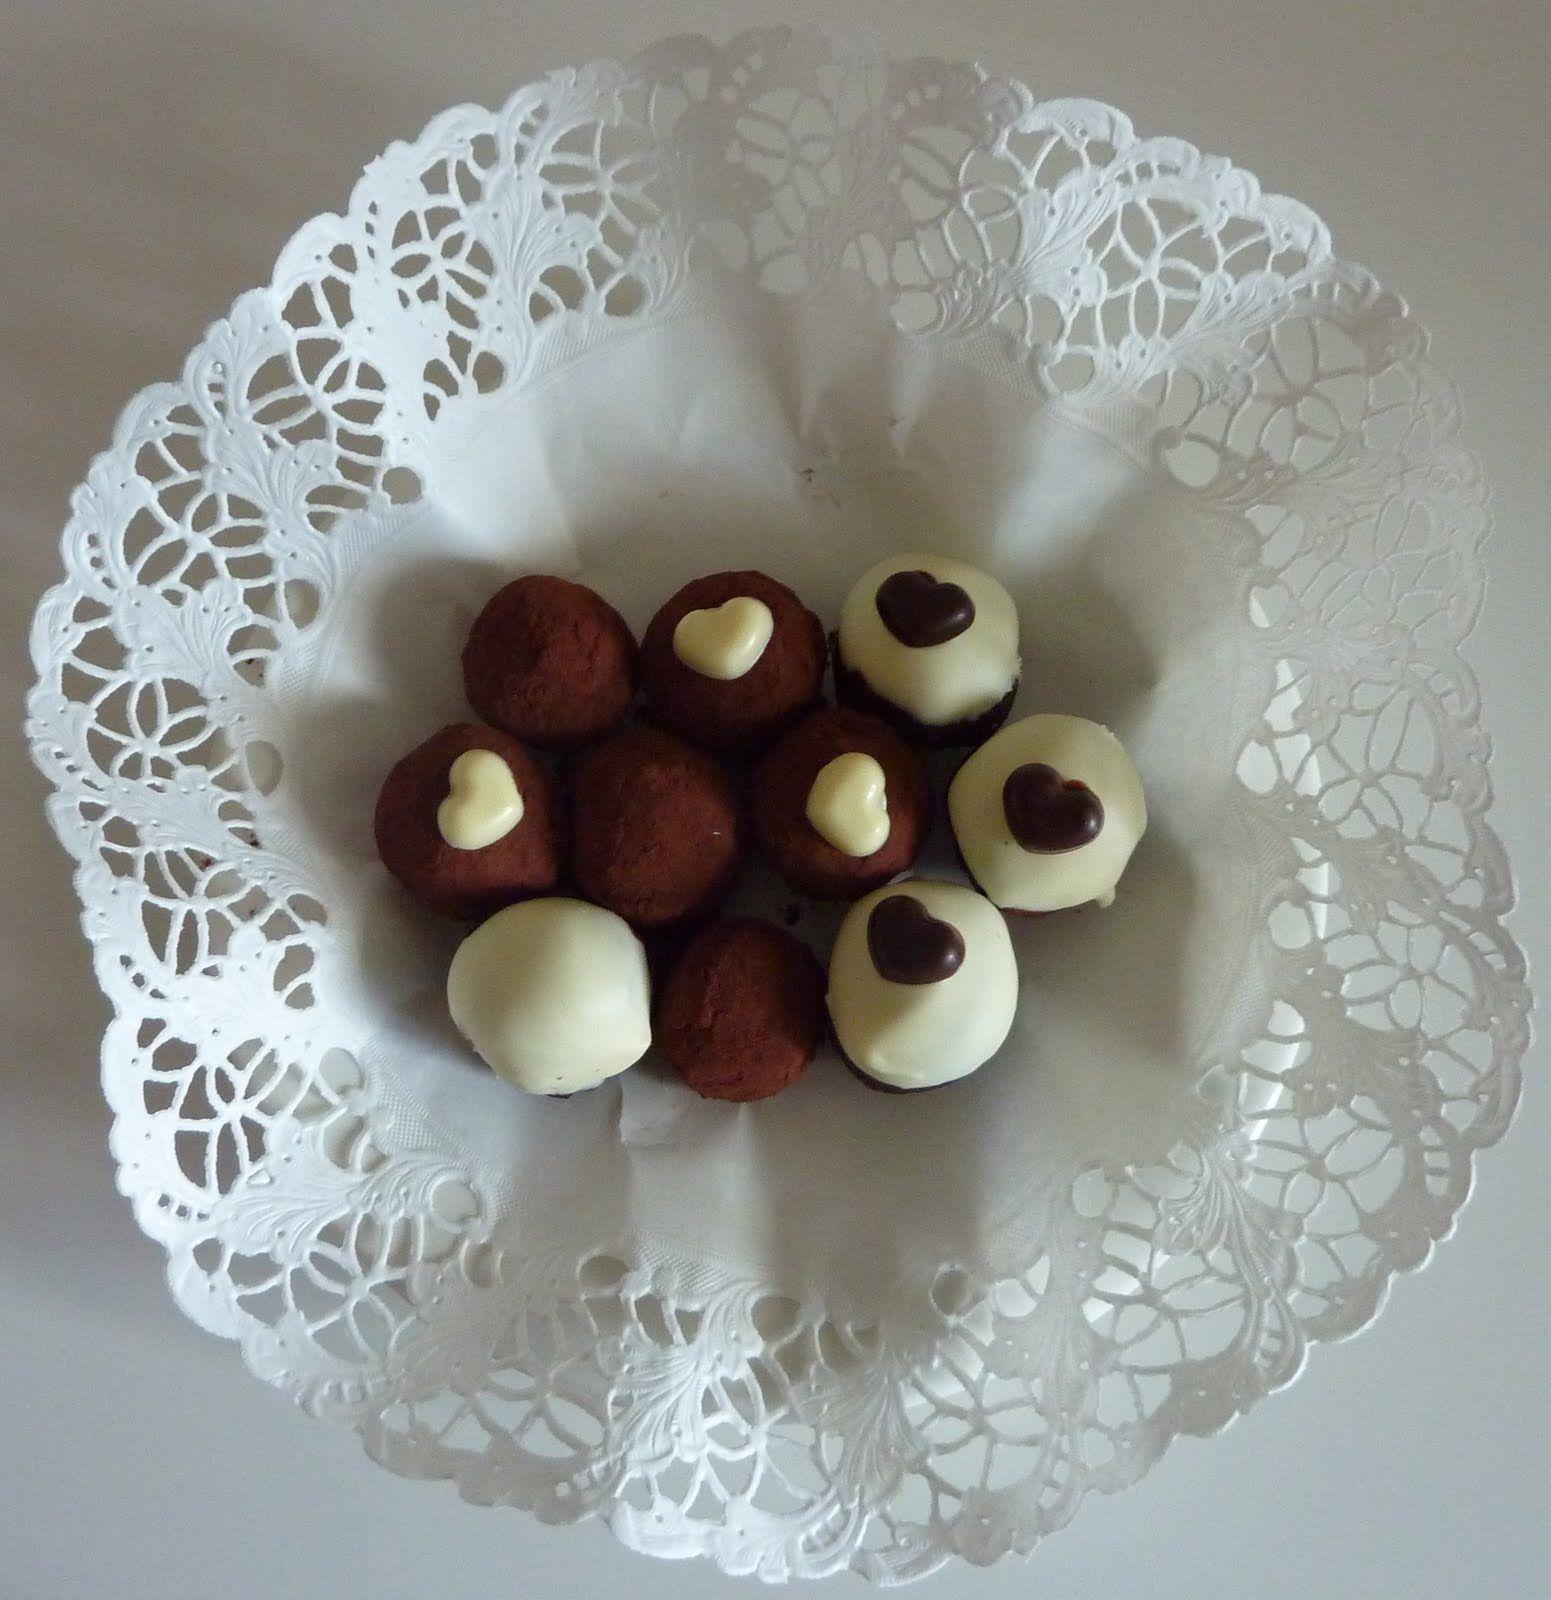 B+W truffles. #yummers